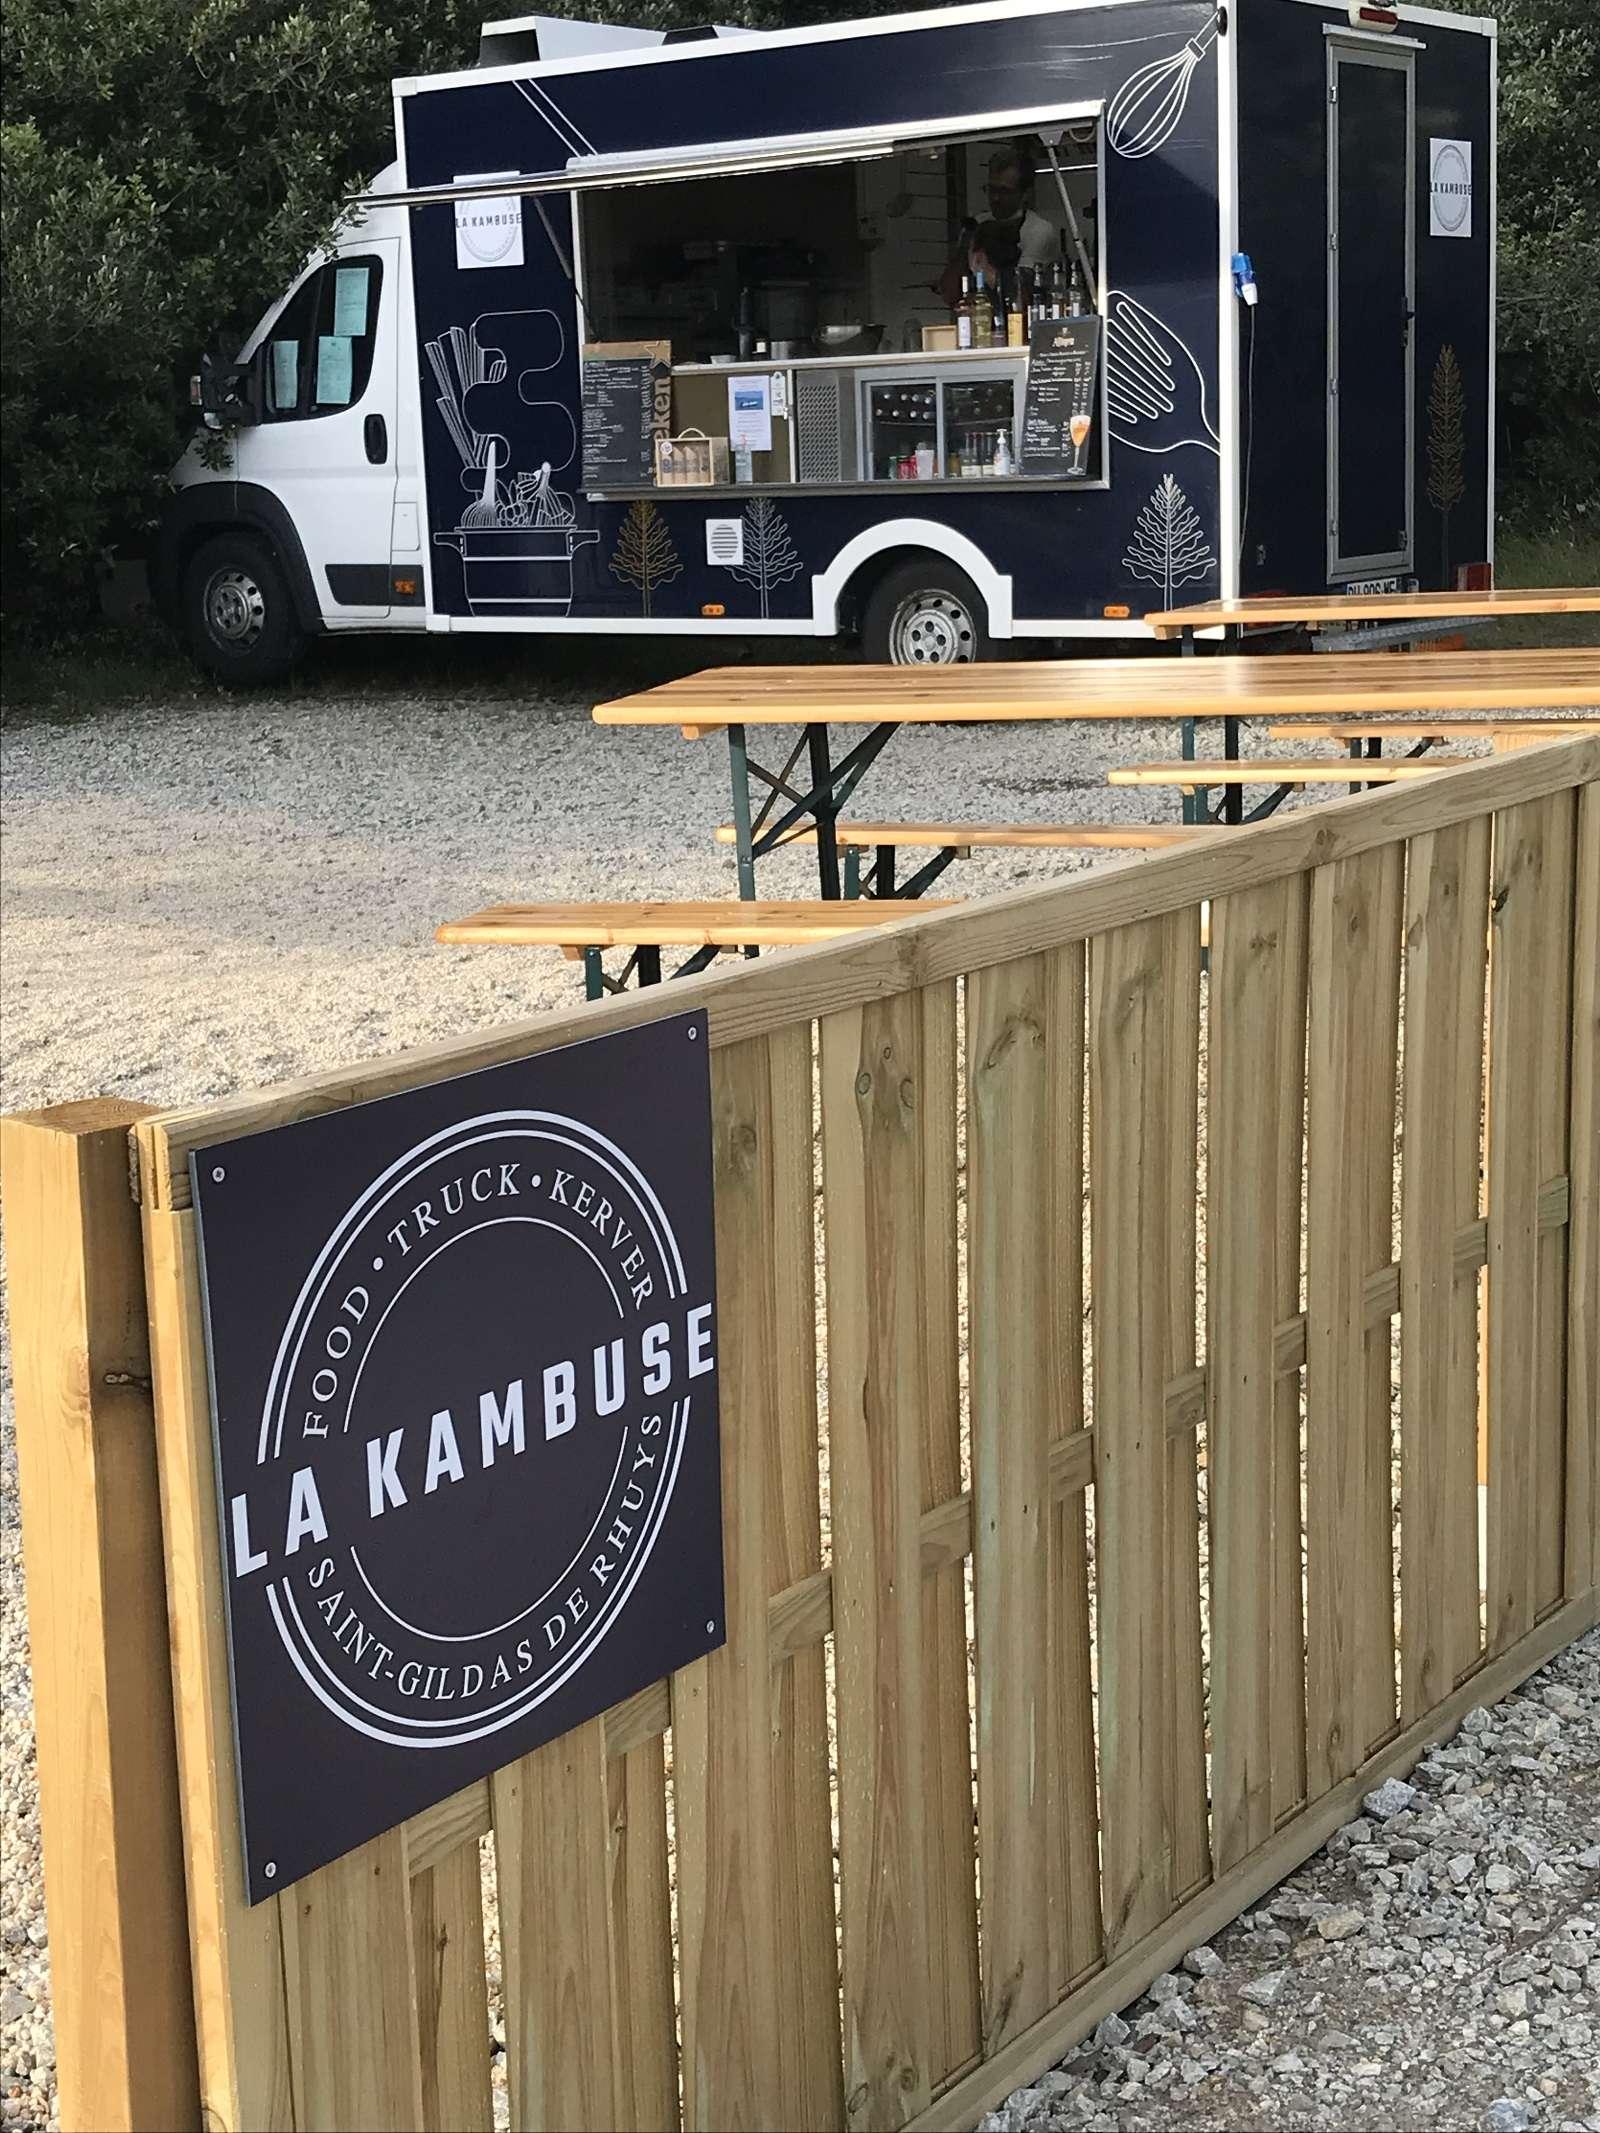 Food Truck La Kambuse